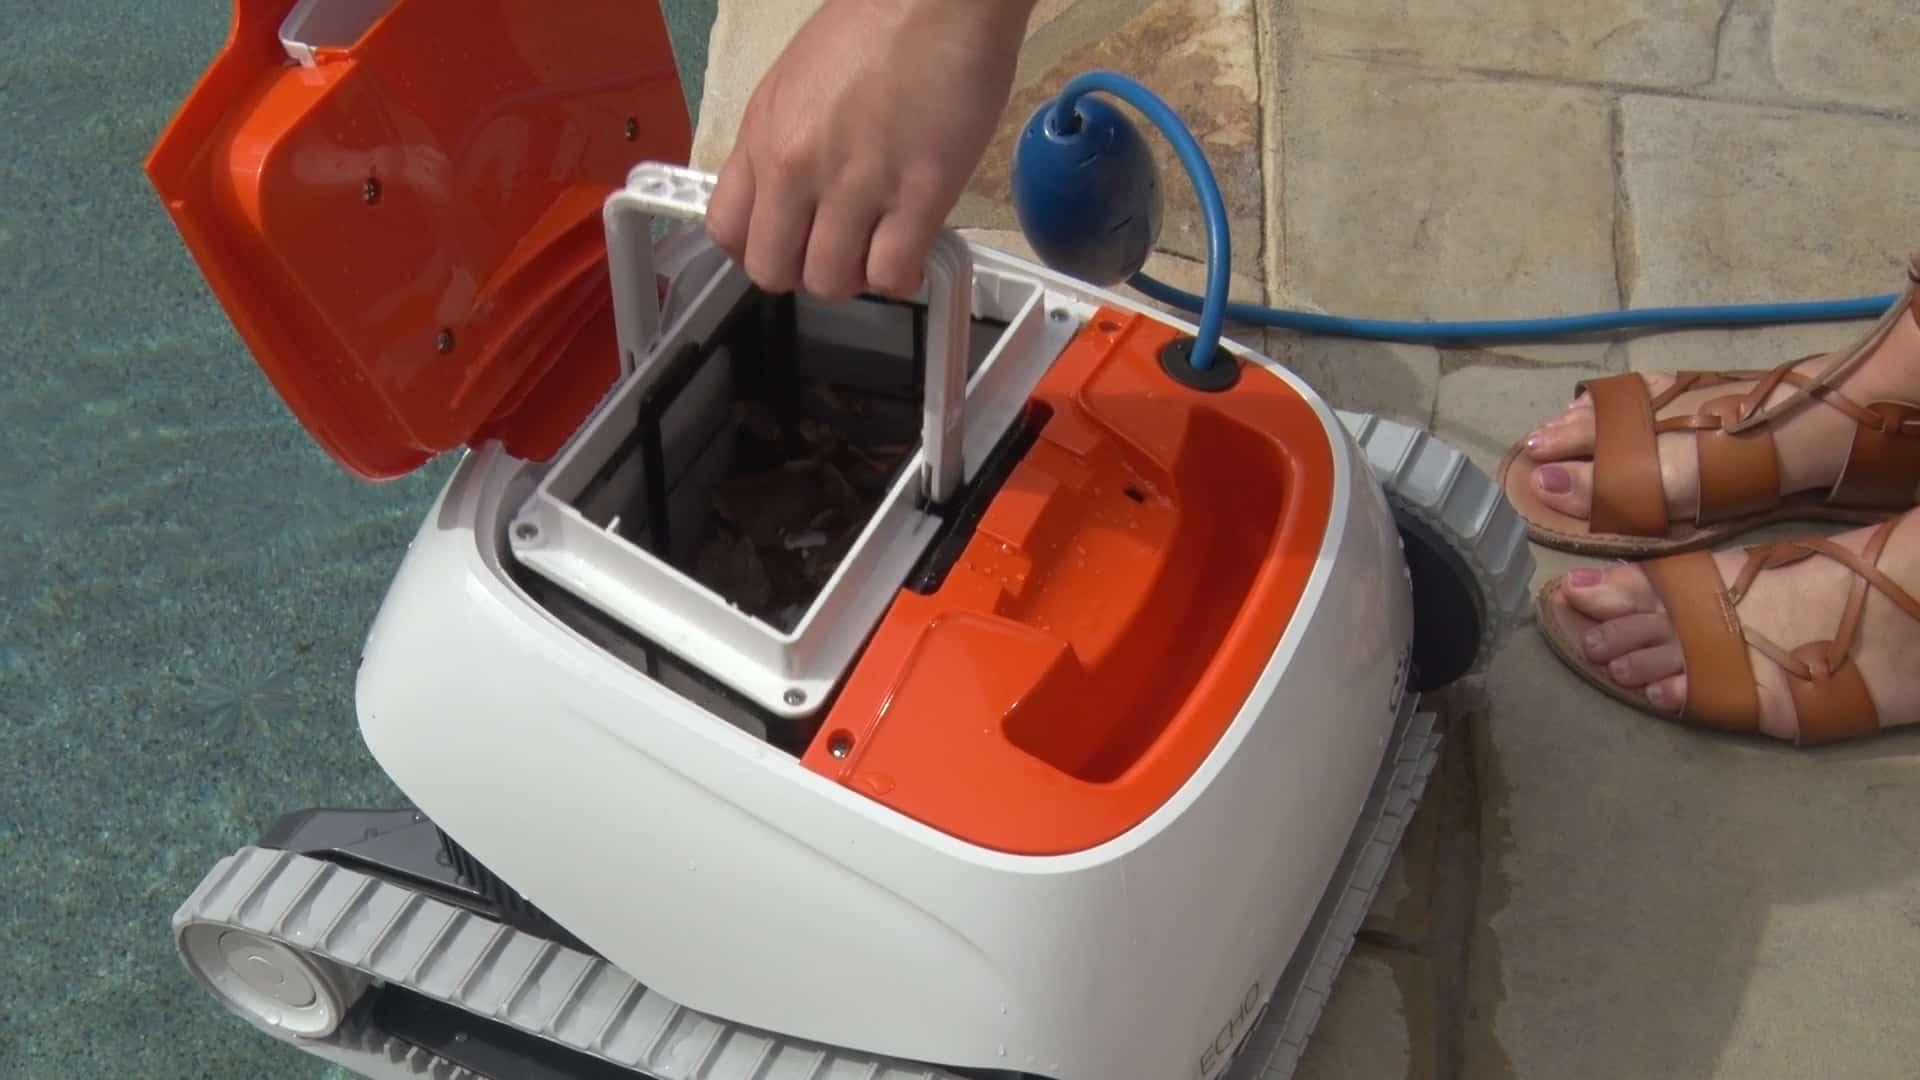 Echo robotic cleaner filter